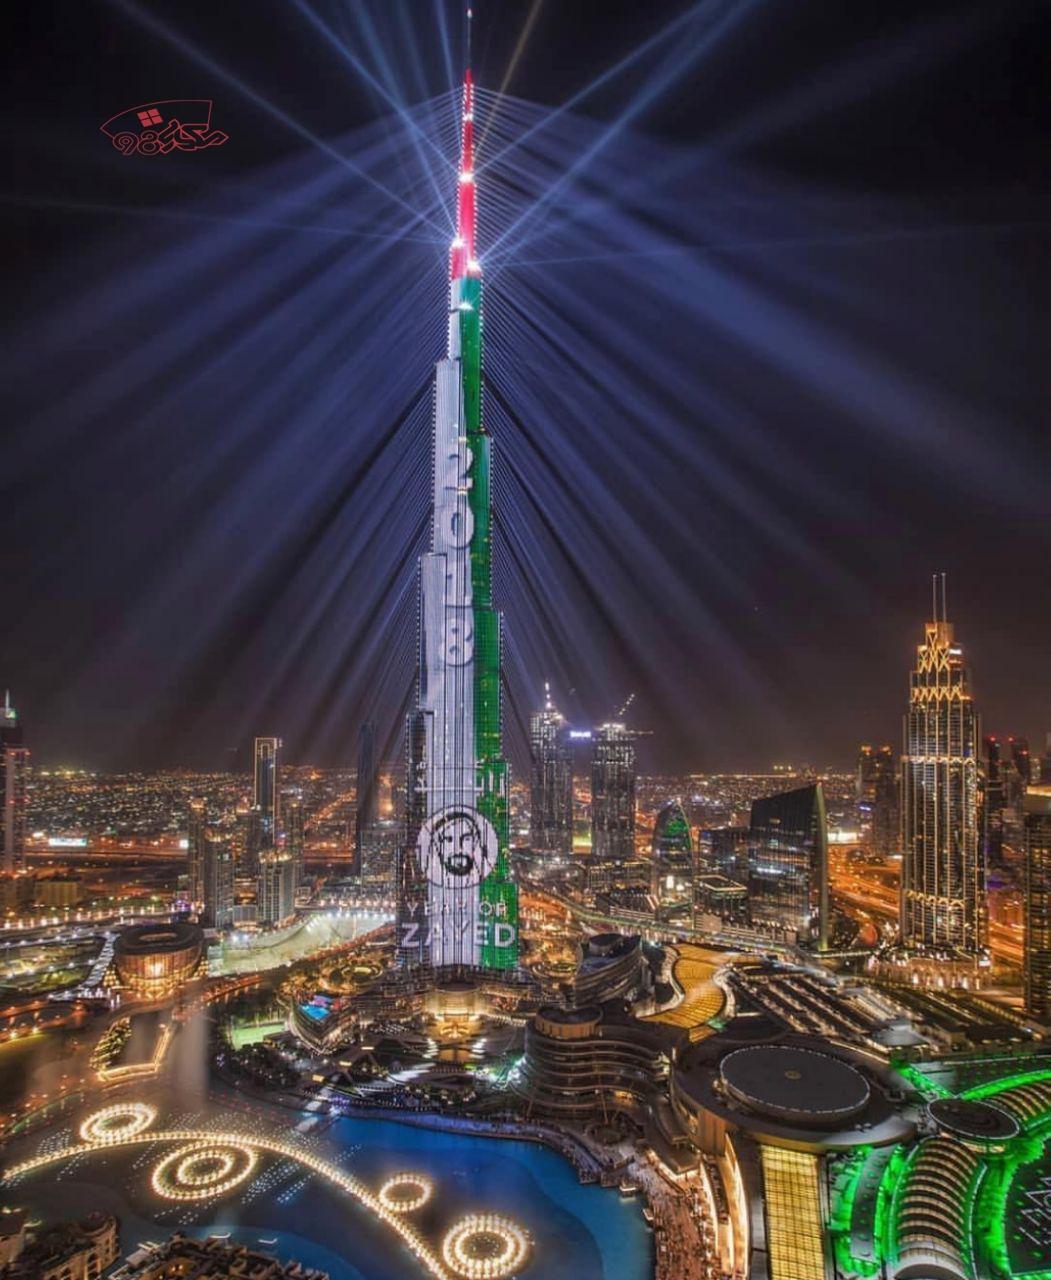 پاورپوینت بررسی معماری برج خلیفه دبی